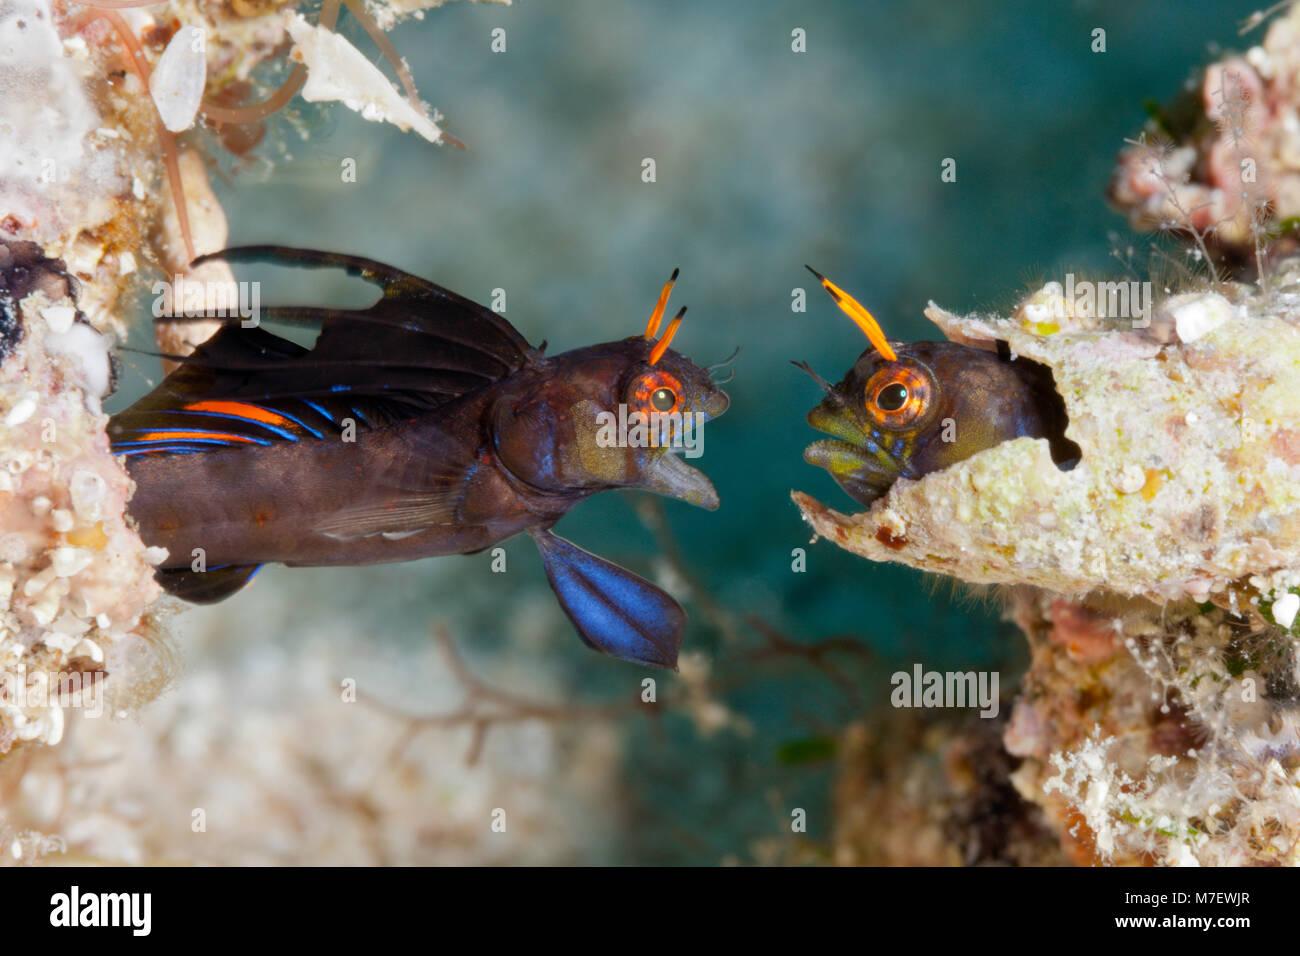 Señal del Golfo Blennies en actitud amenazadora, Emblemaria hypacanthus, La Paz, Baja California Sur, México Imagen De Stock